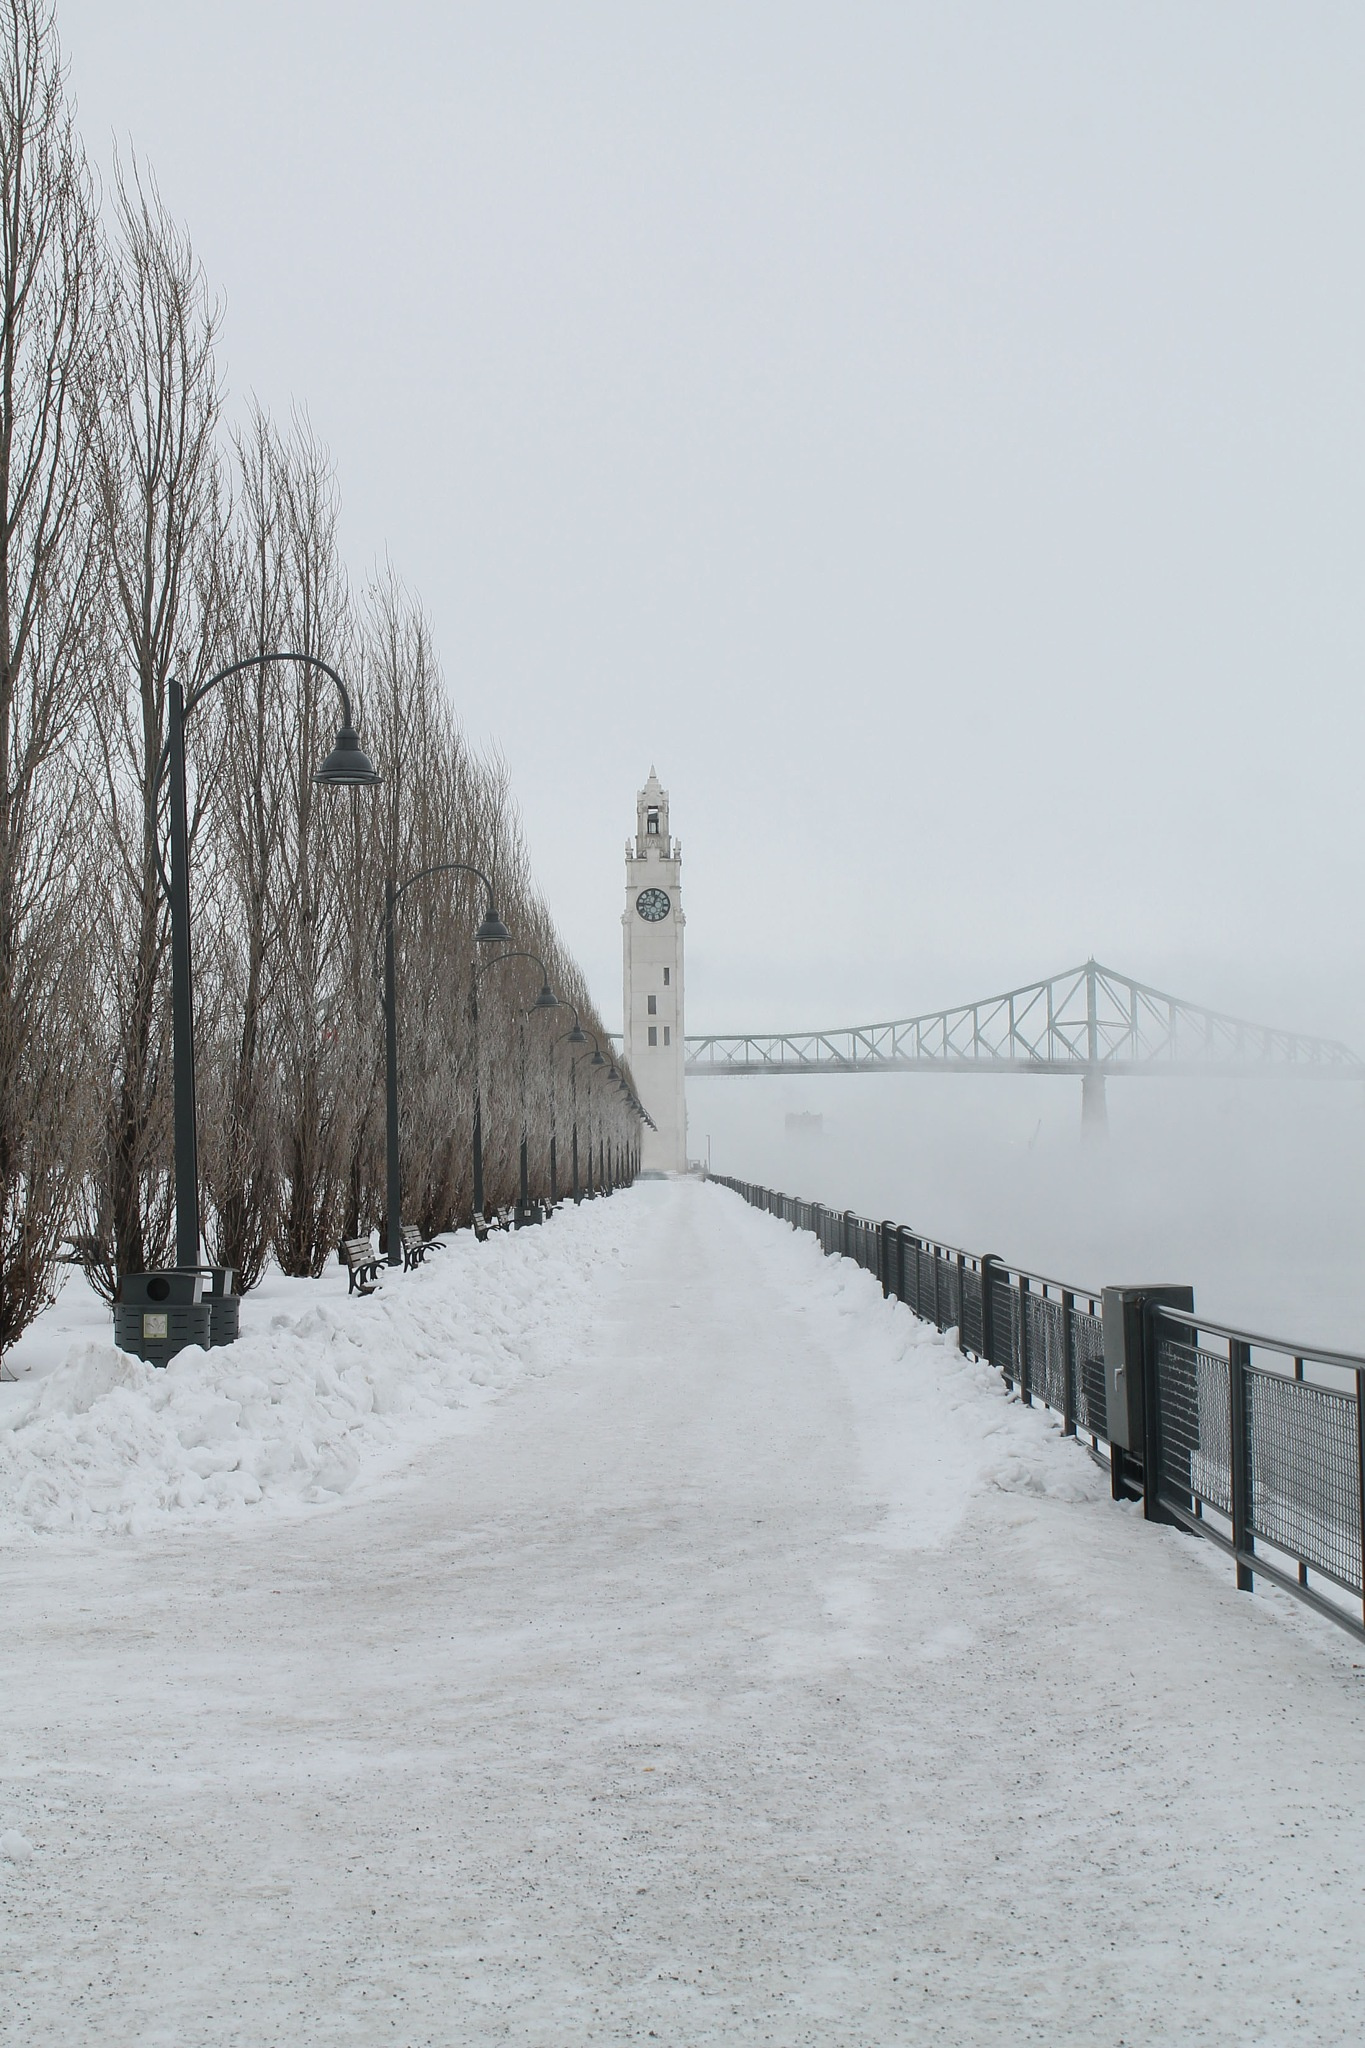 Montreal Freeze © Copyright 2017, Verne Varona by VerneVarona